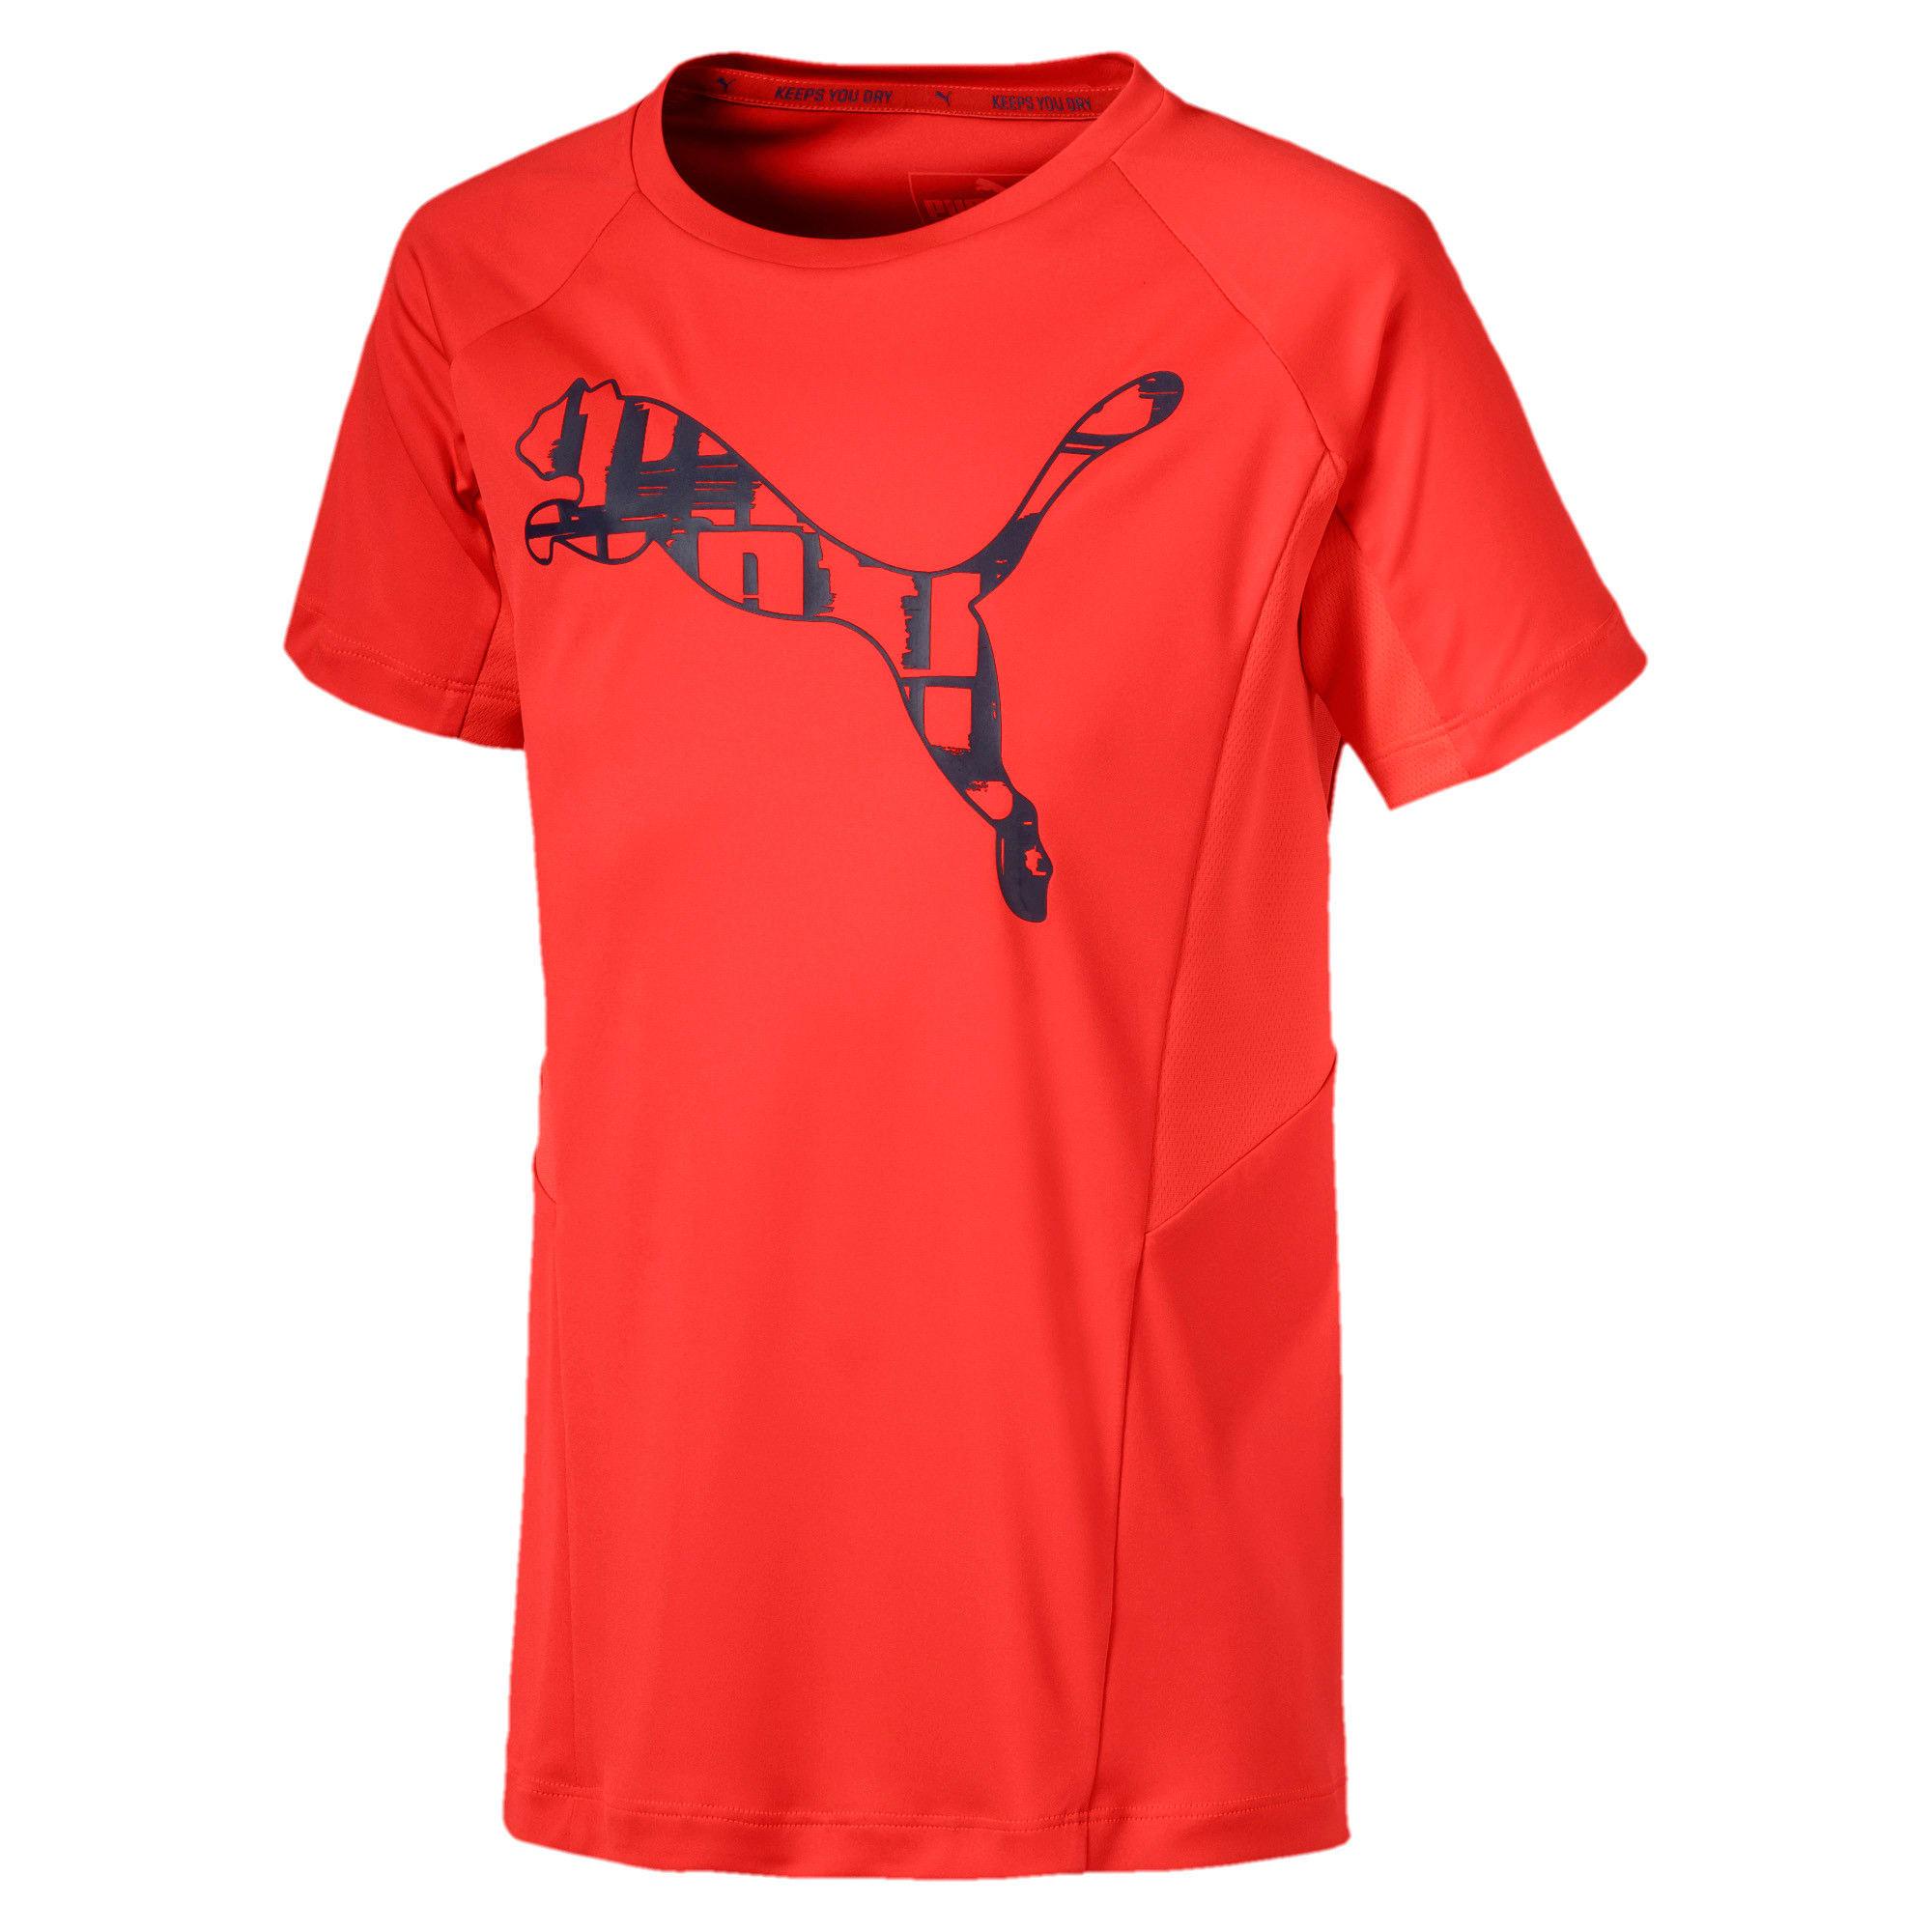 Thumbnail 1 of Active Sports Short Sleeve Boys' Tee, Nrgy Red, medium-IND